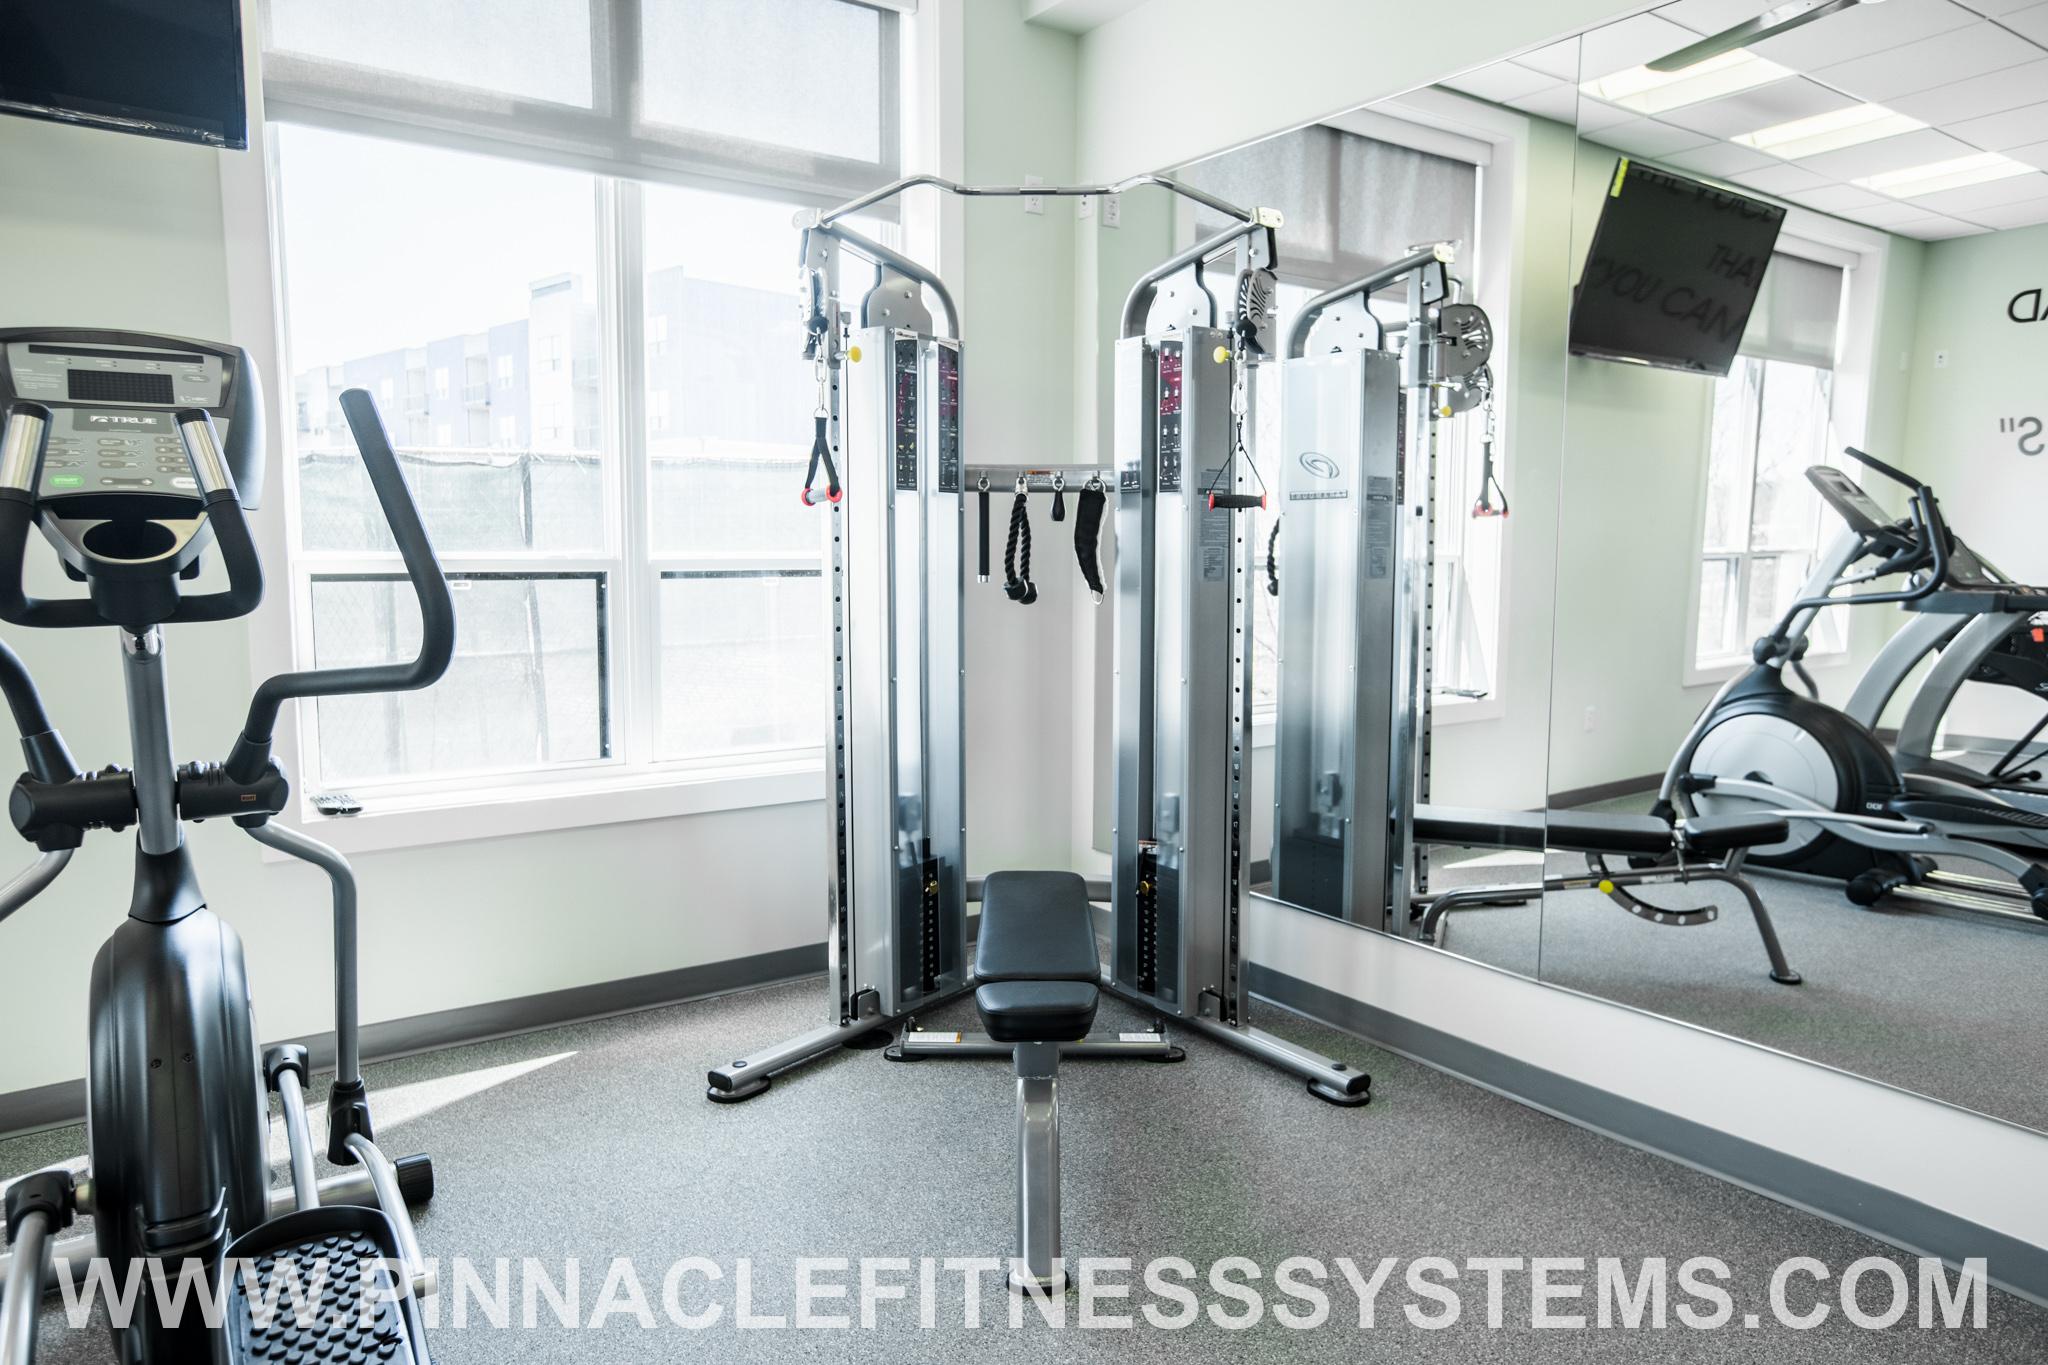 PFS-Luxury-Apartment-Complex-Fitness-Center-7.jpg